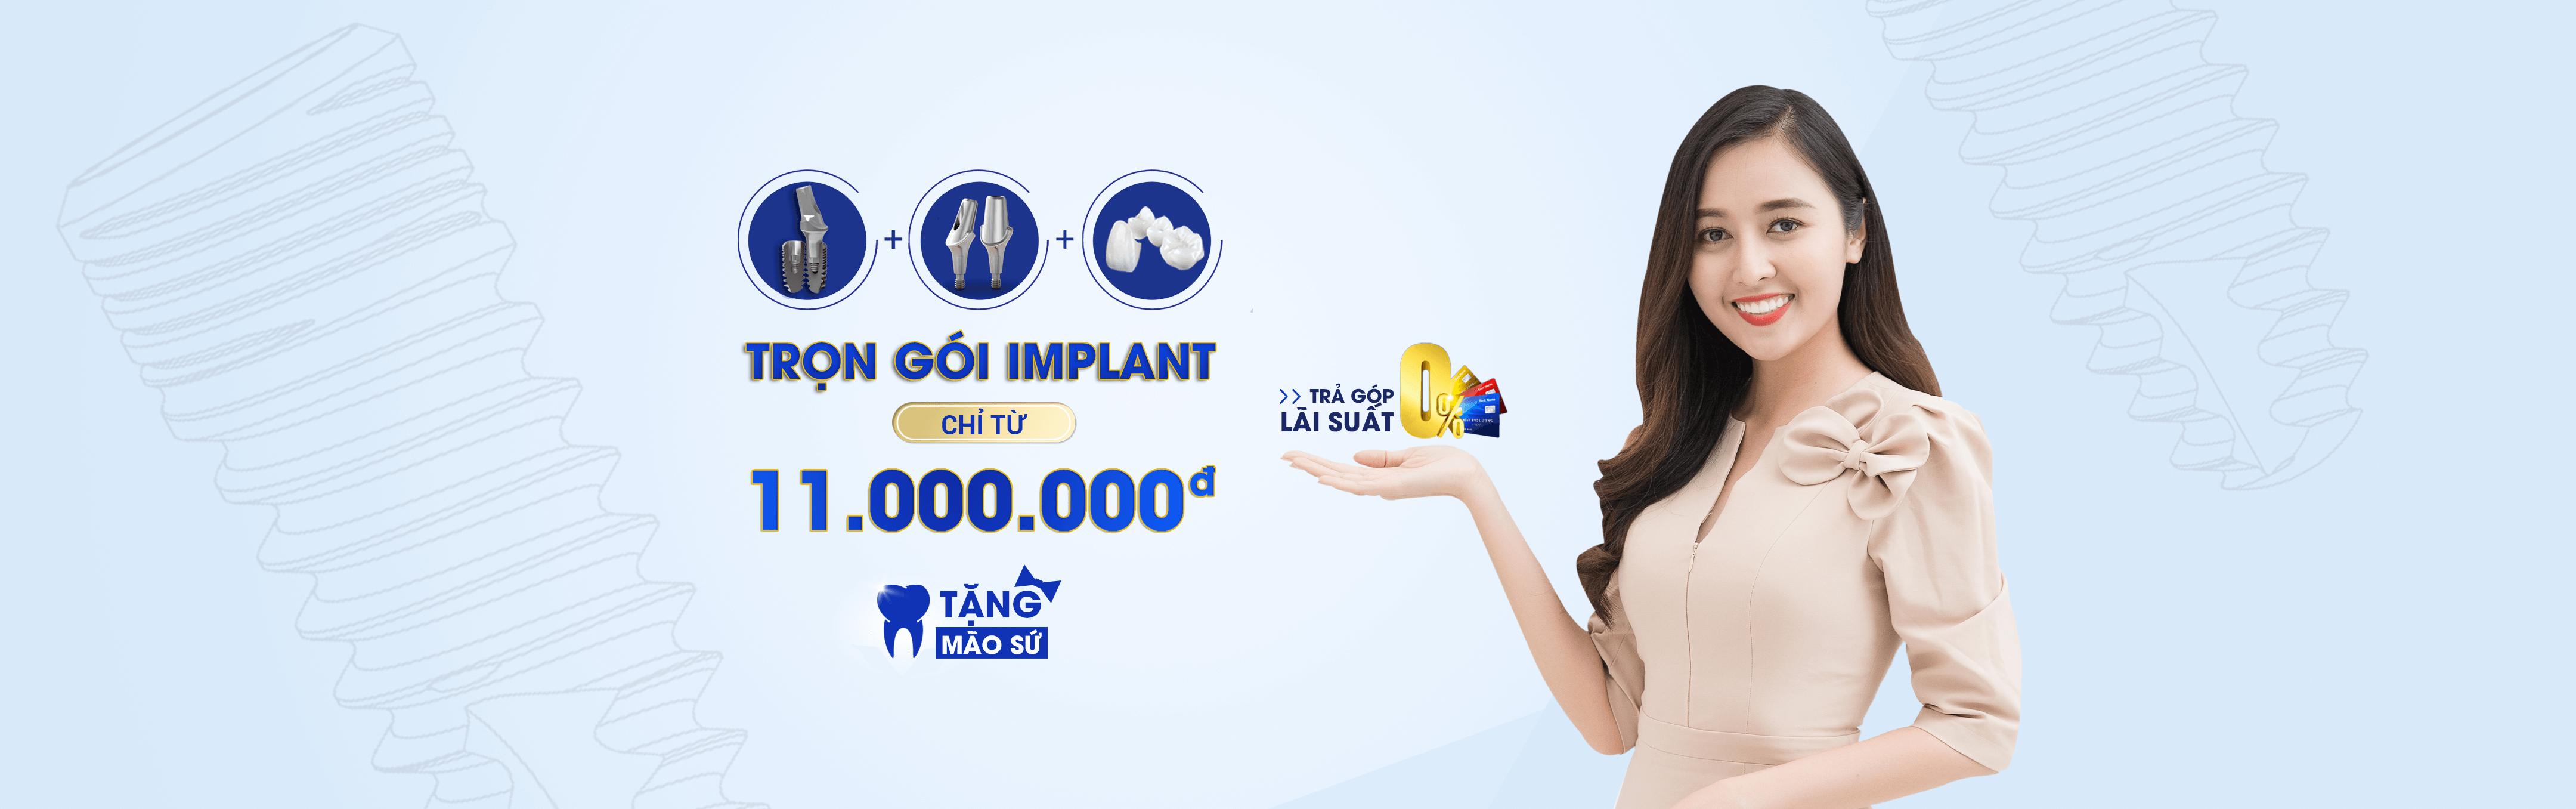 banner-implant